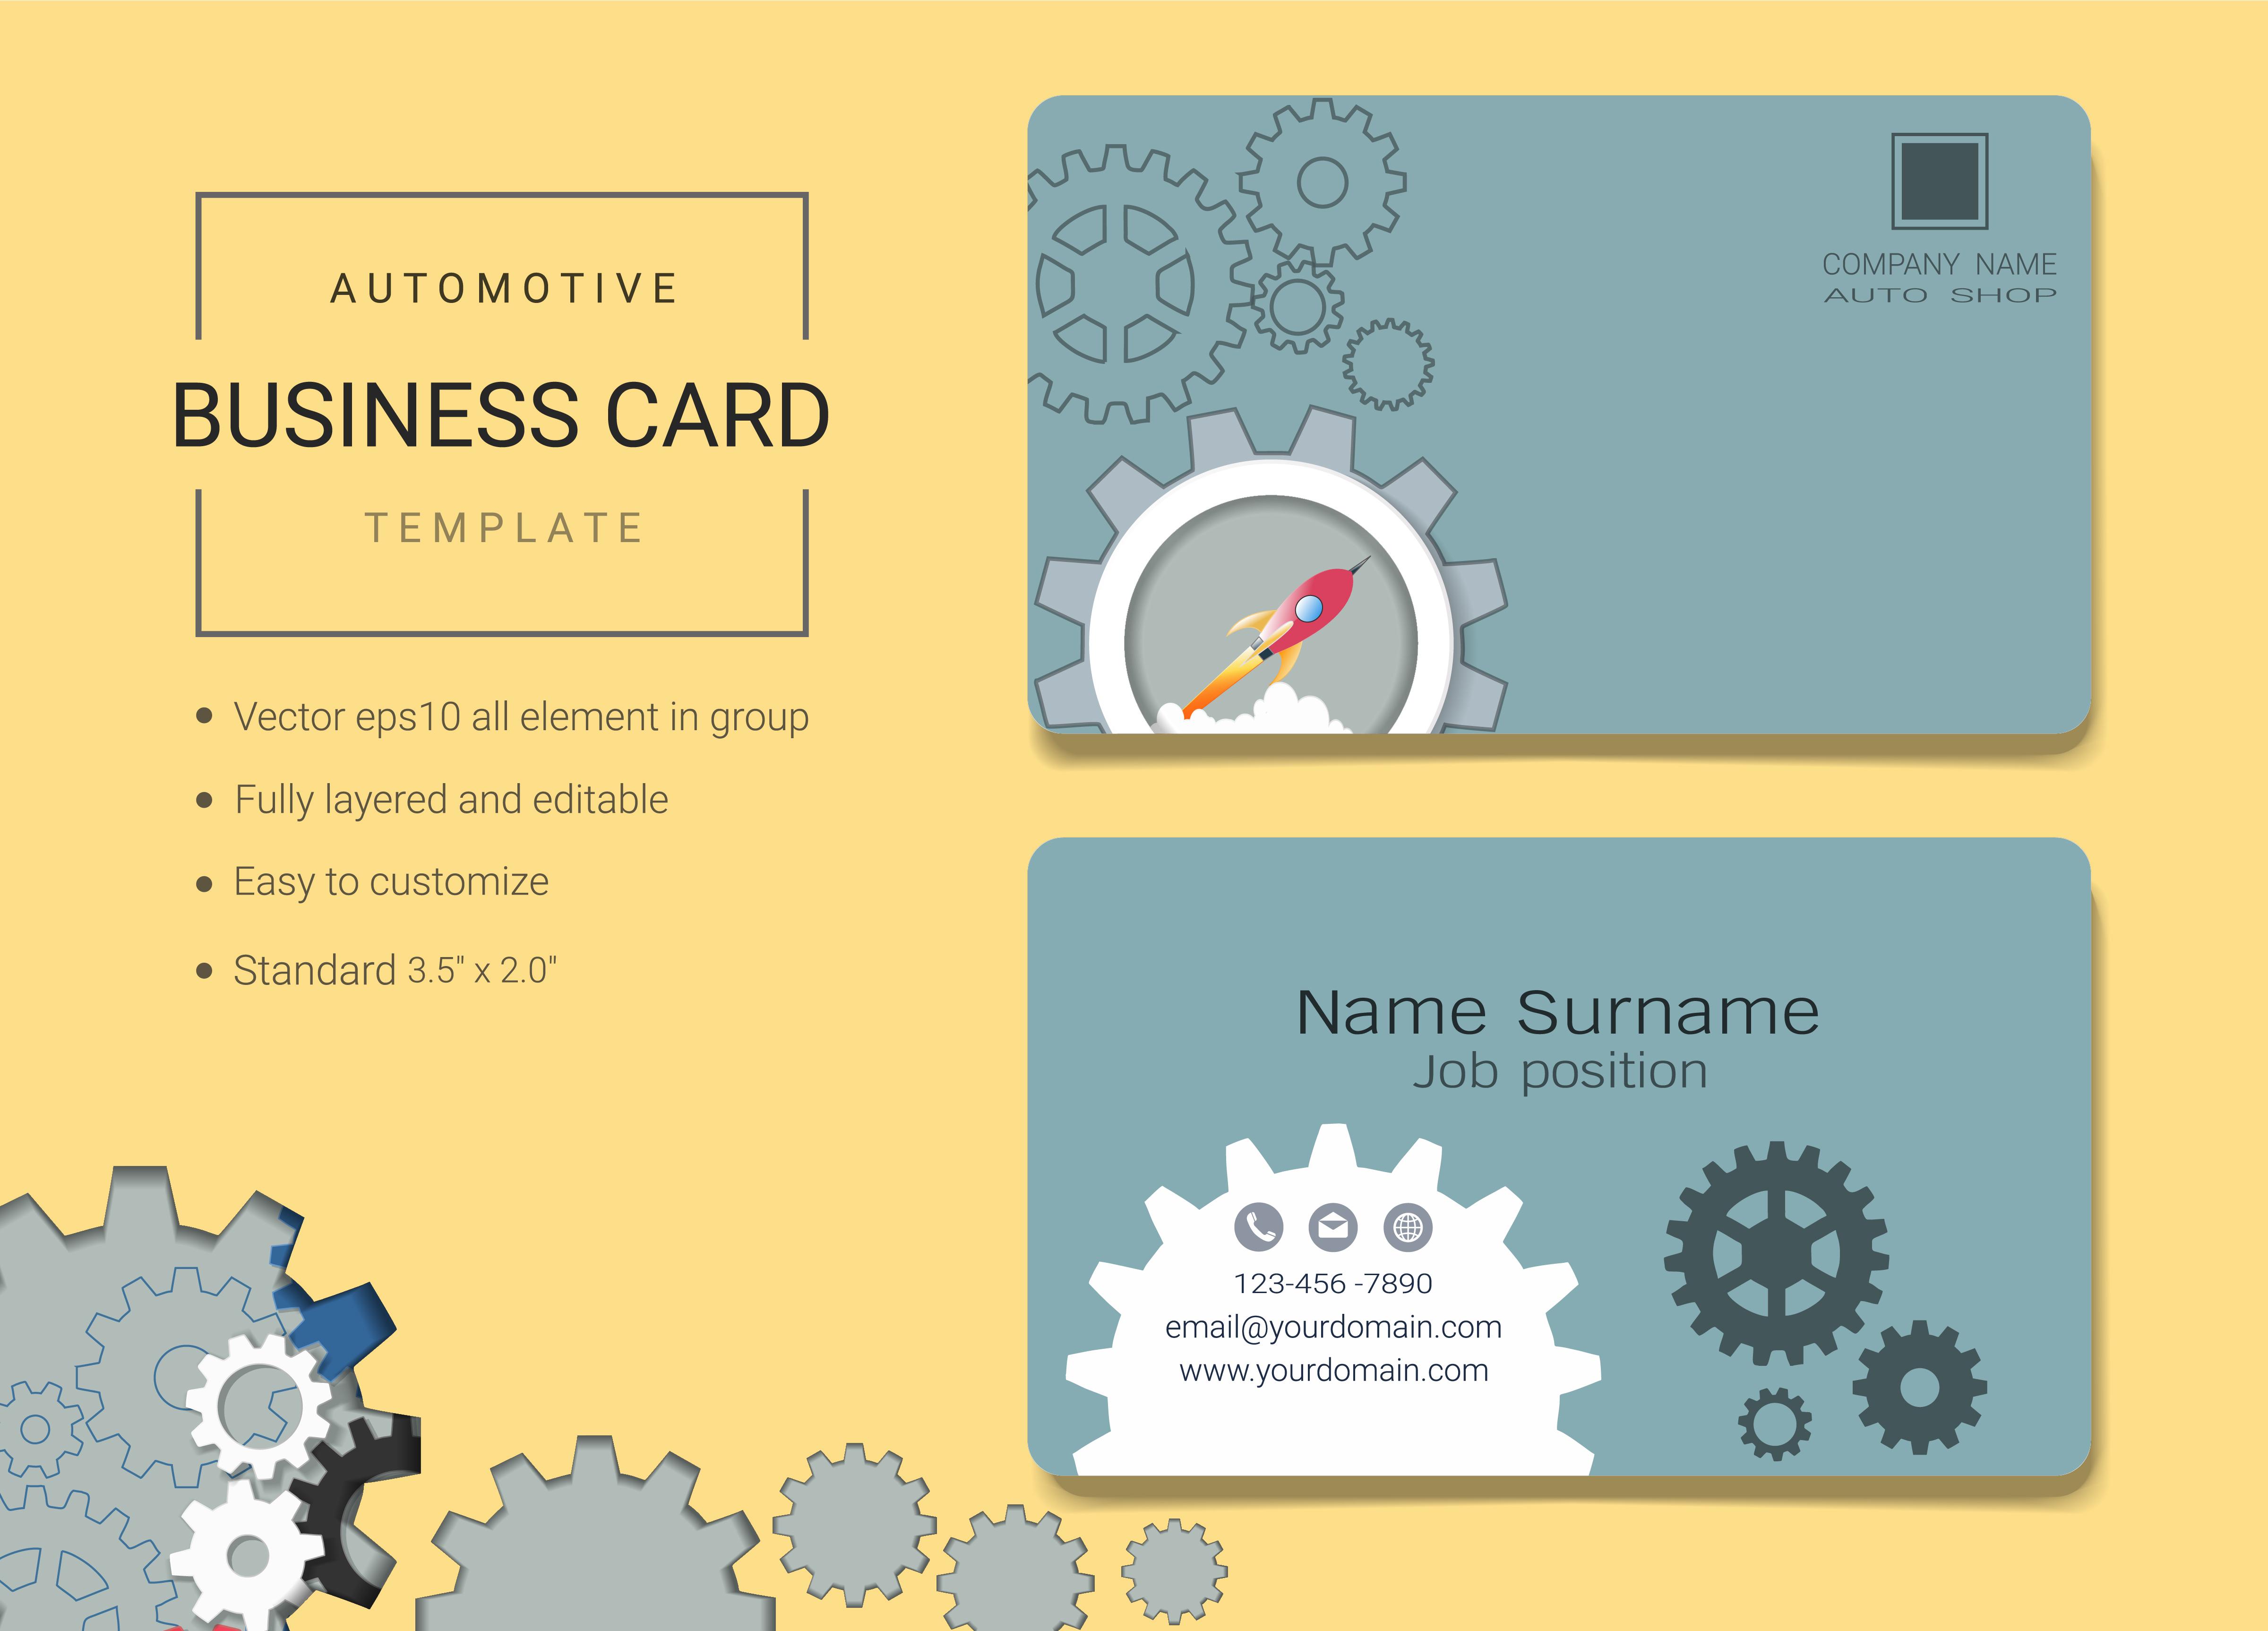 automotive business name card design template 527969